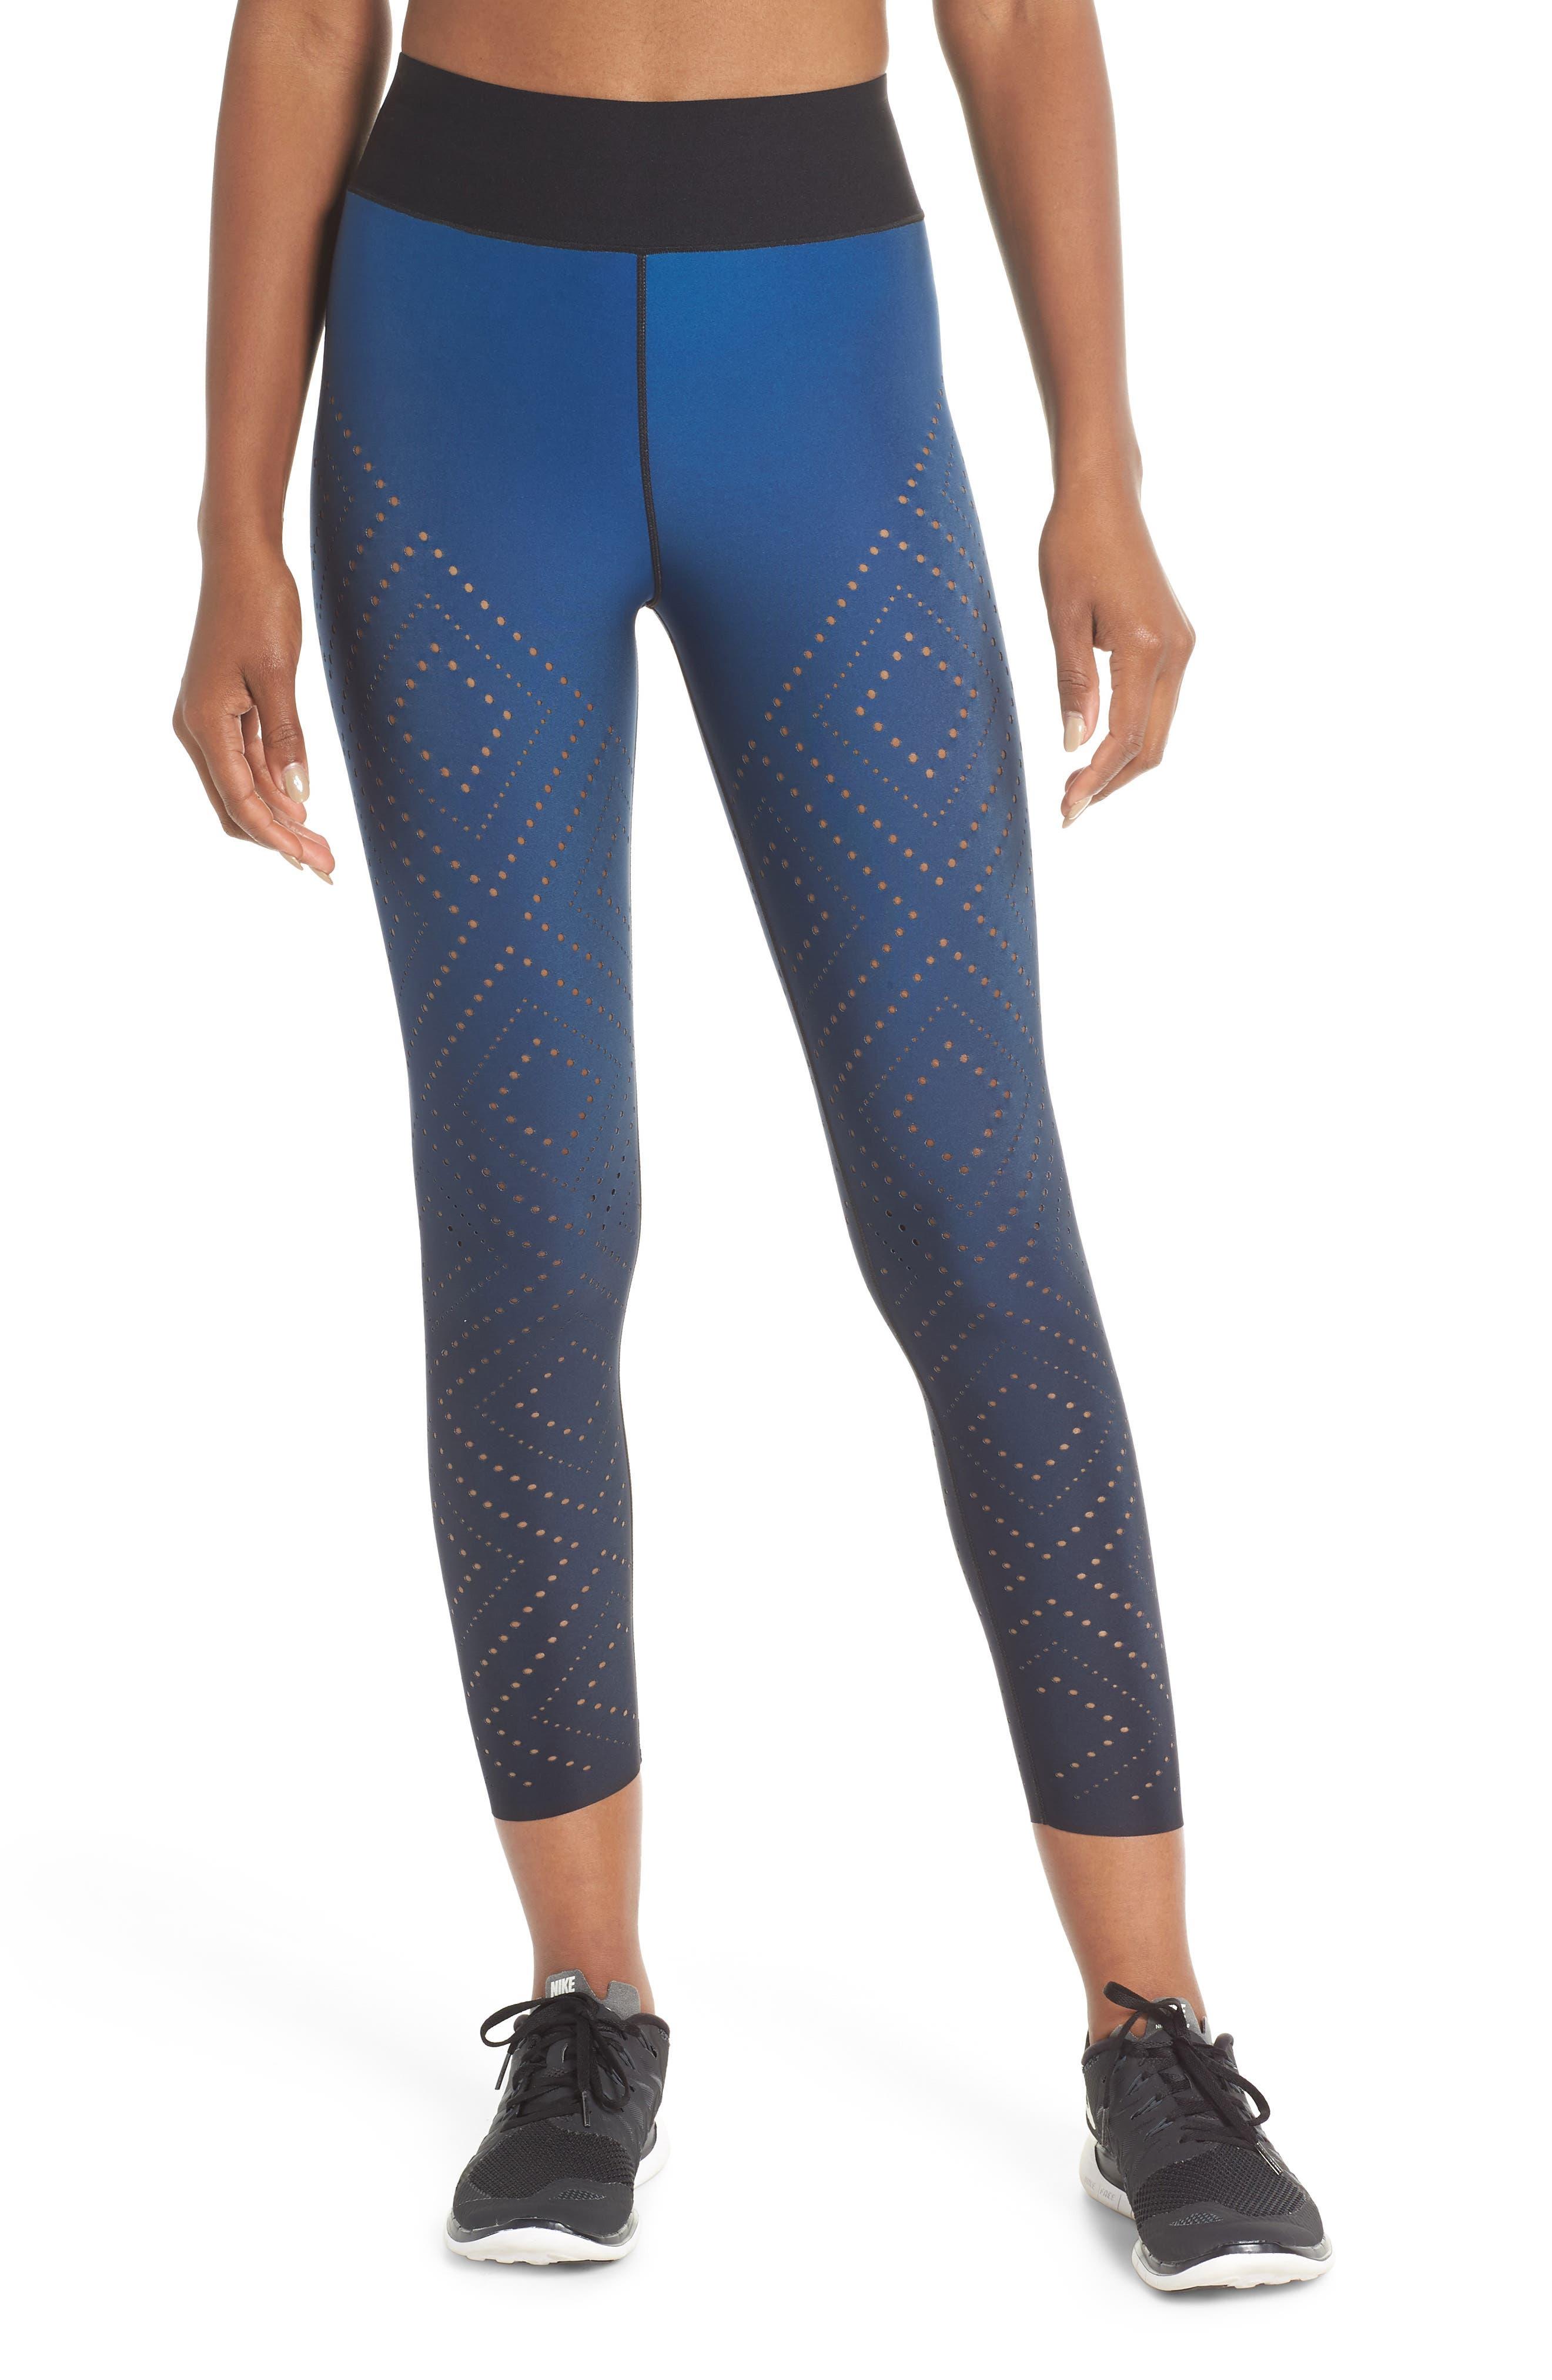 Sprinter High Argyle Pixelate Leggings,                         Main,                         color, GRADIENT SAPPHIRE